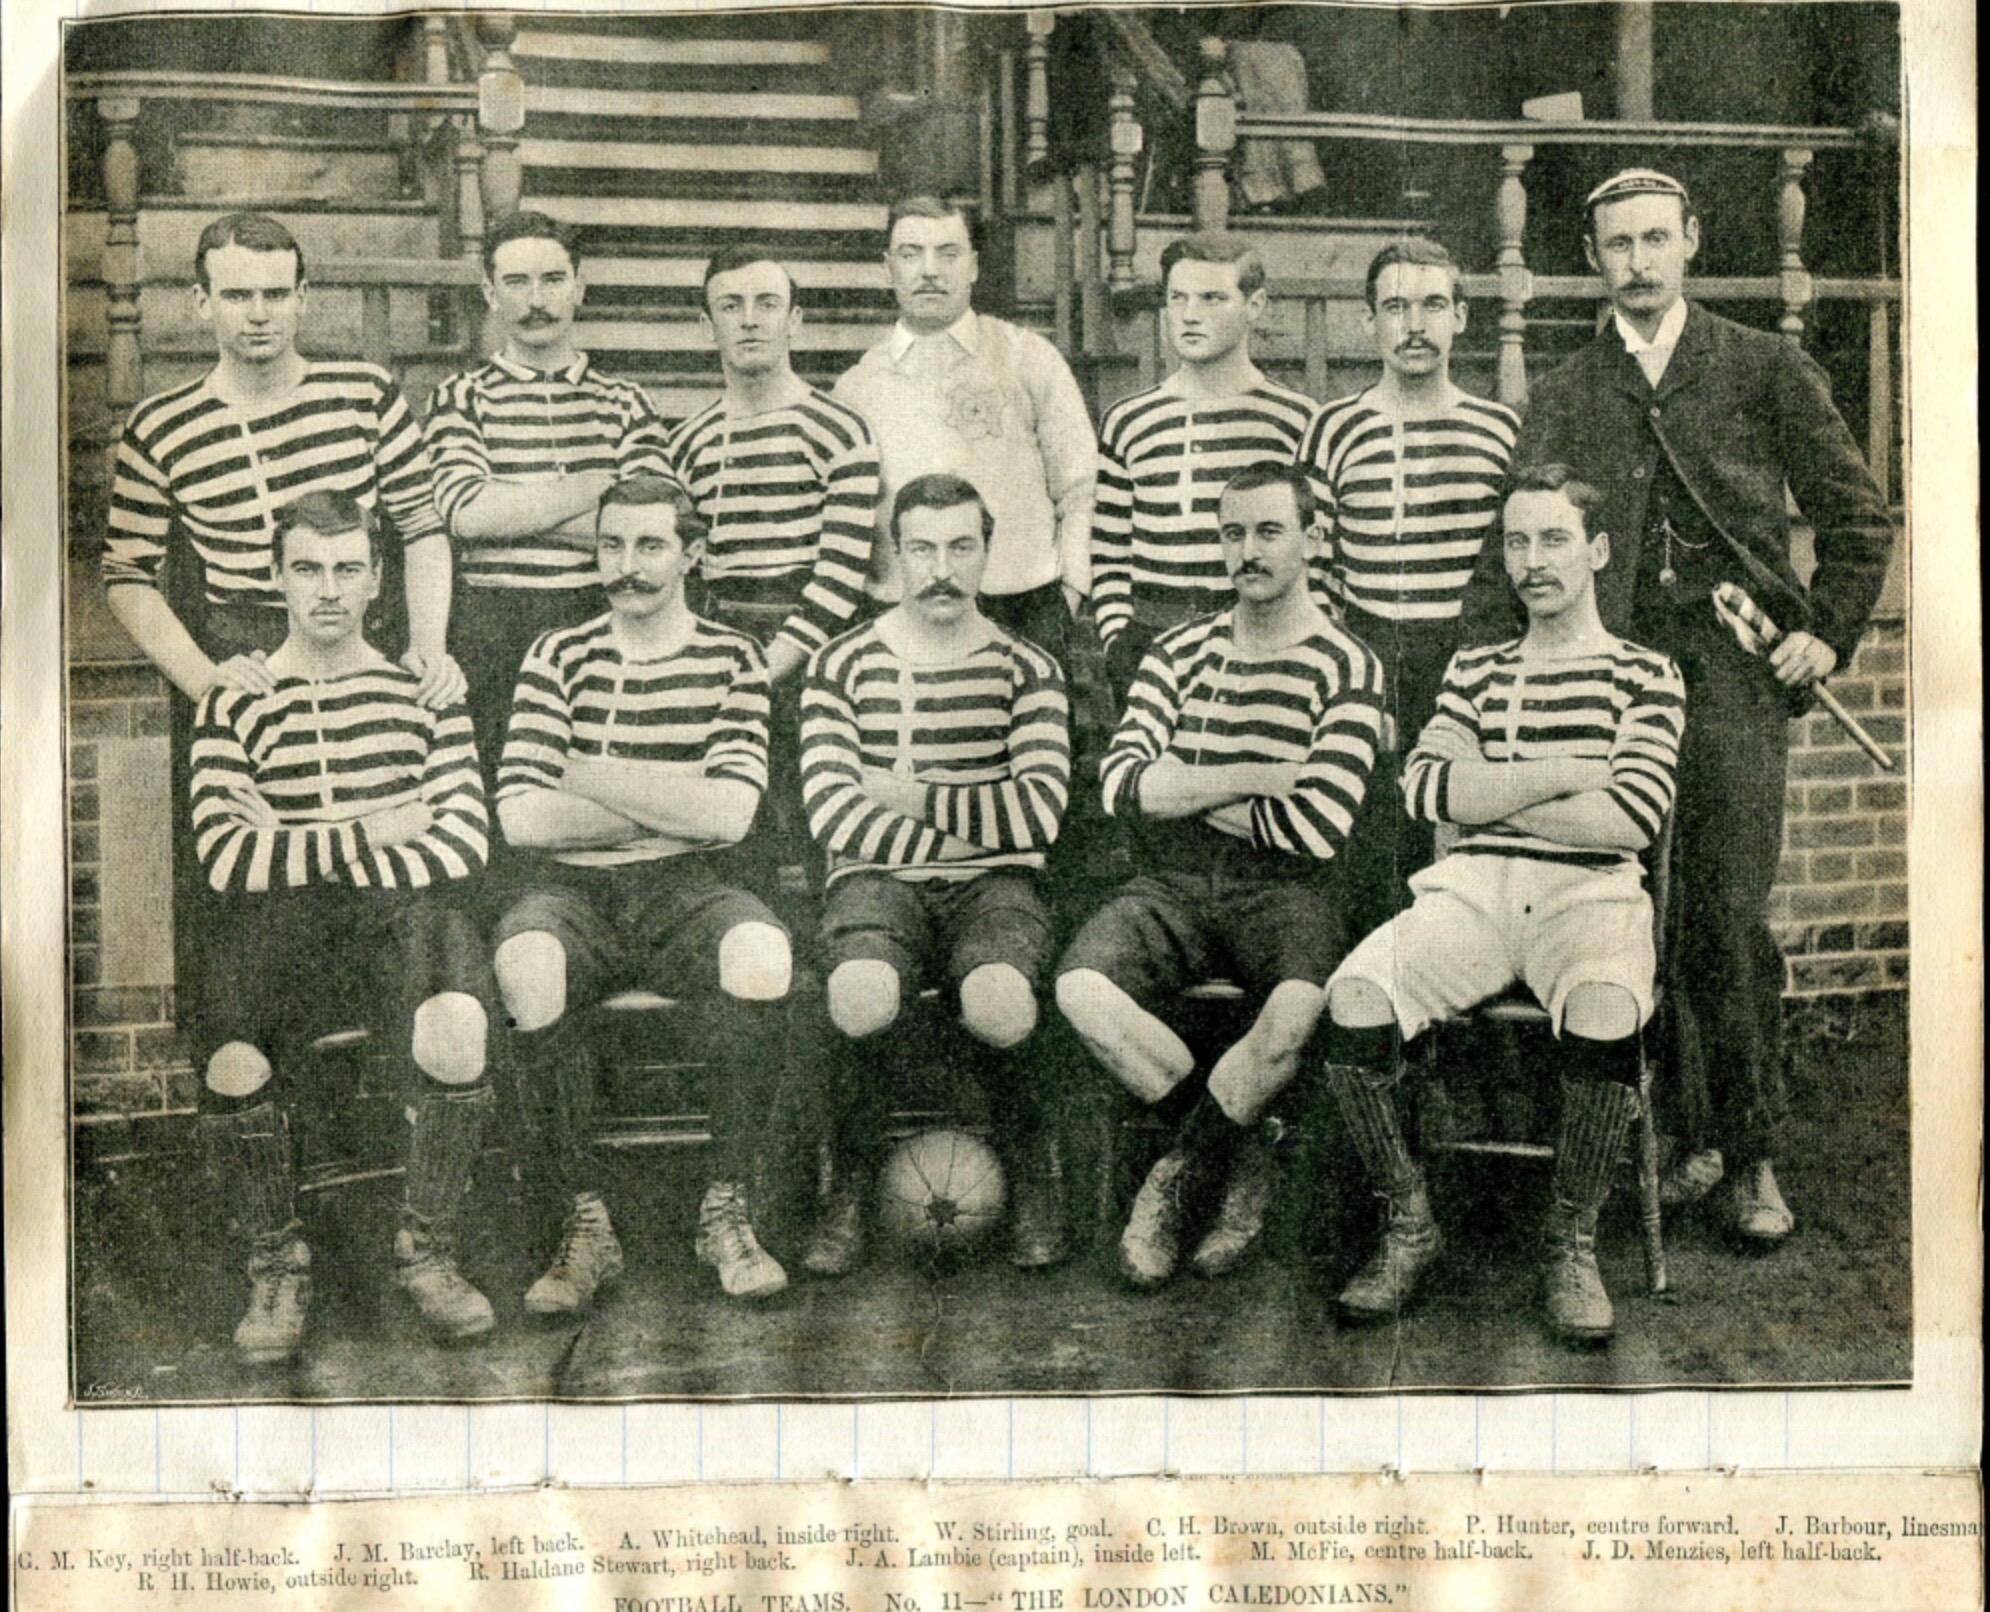 London Caledonians 1894